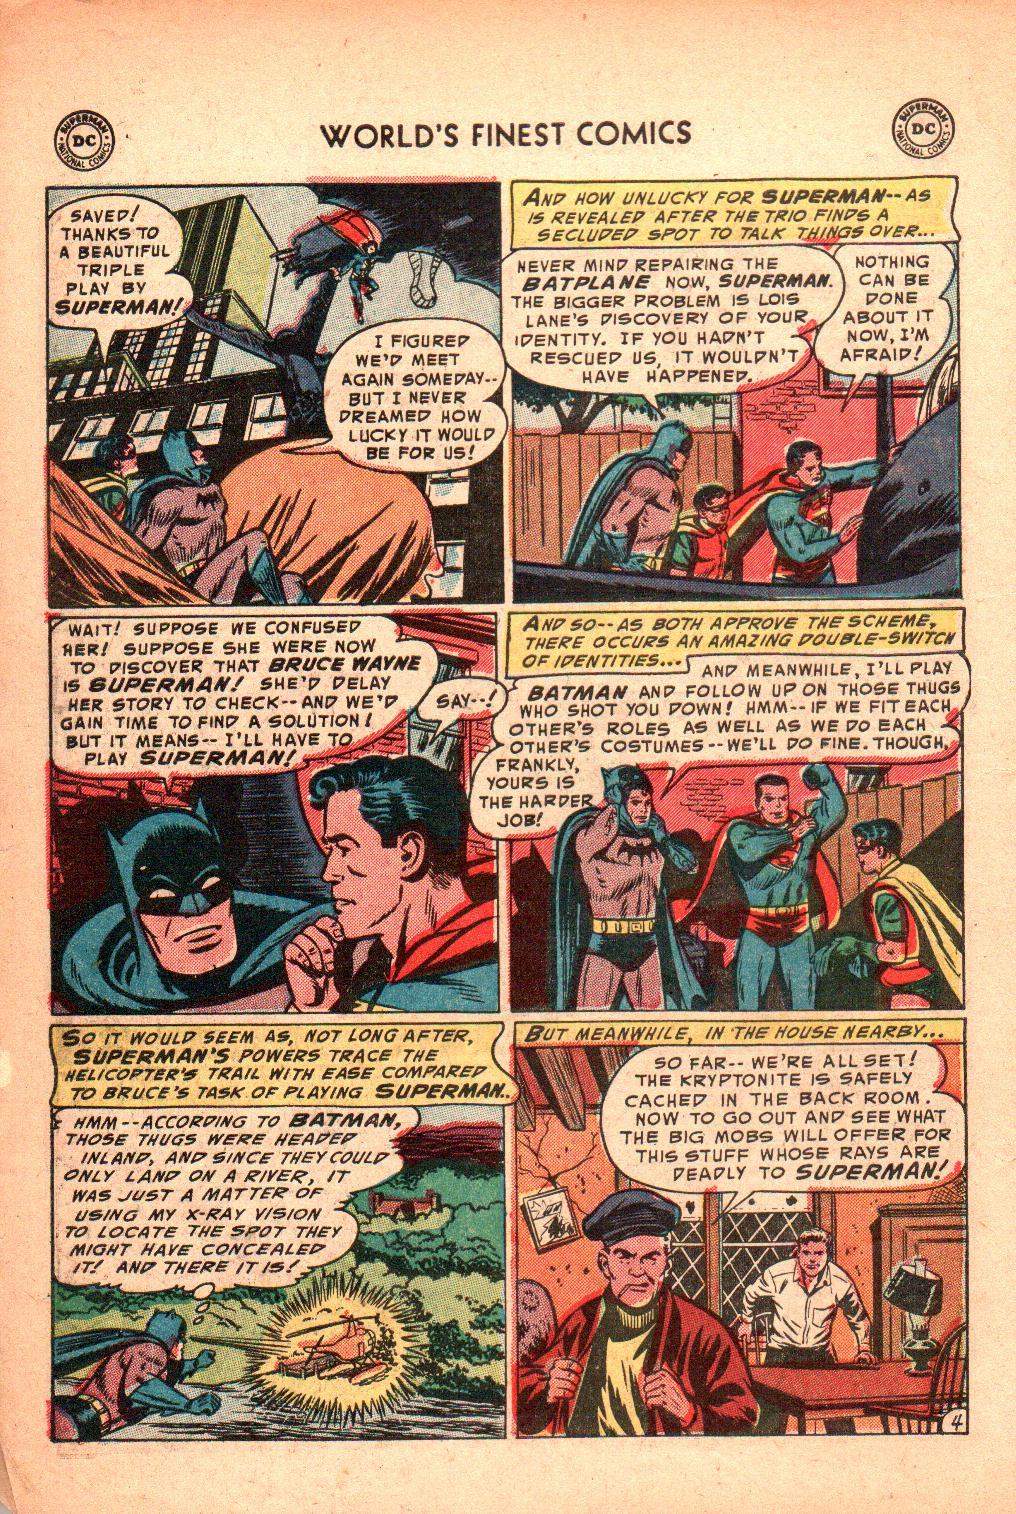 Read online World's Finest Comics comic -  Issue #71 - 8